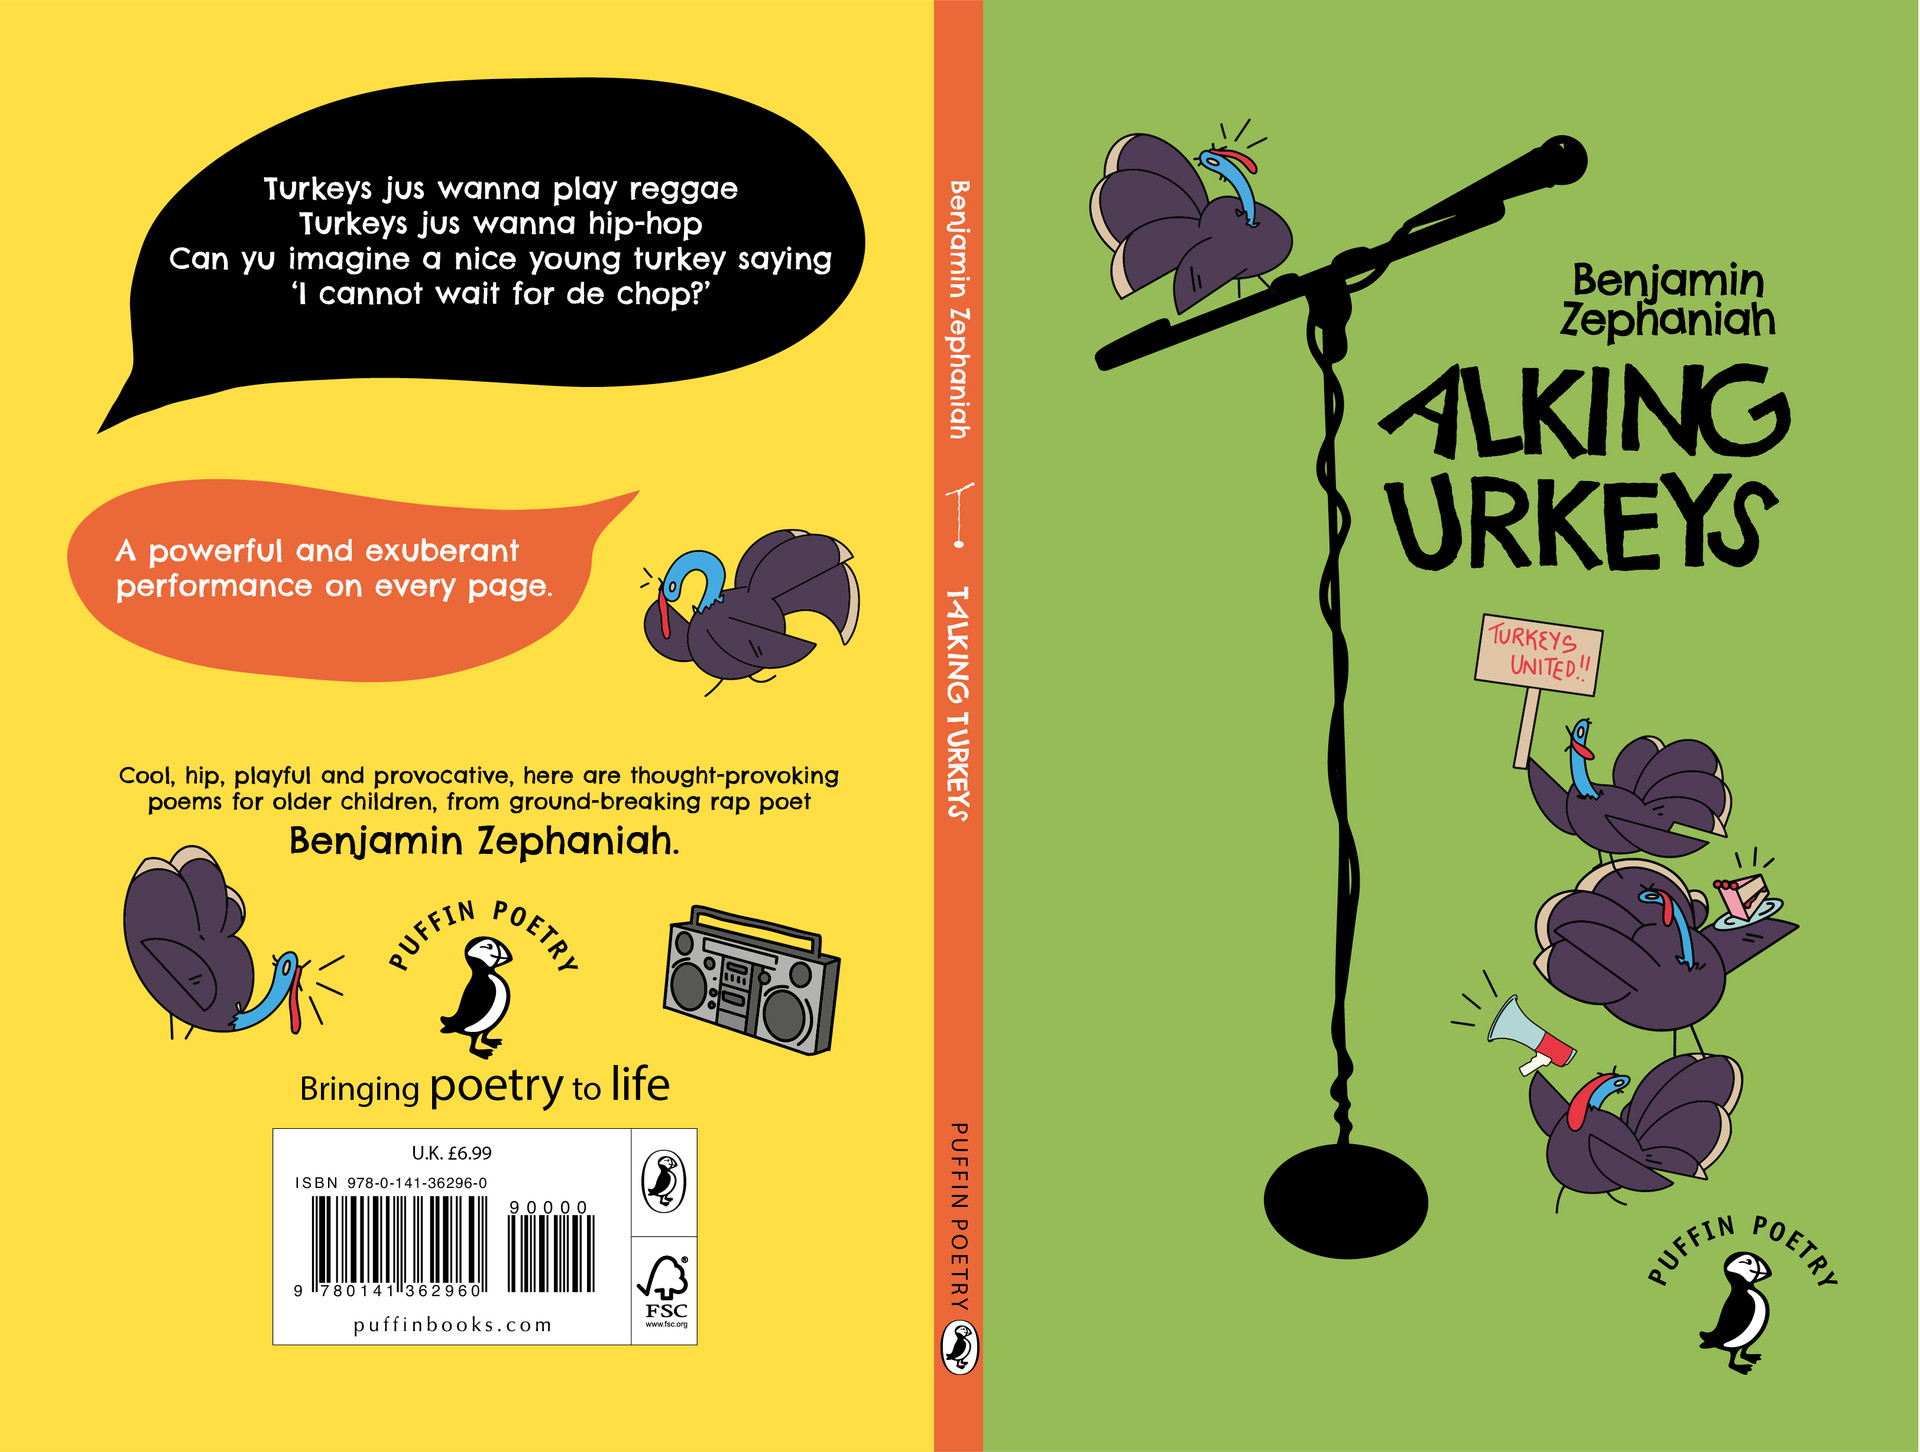 Talking Turkeys Book Cover Design